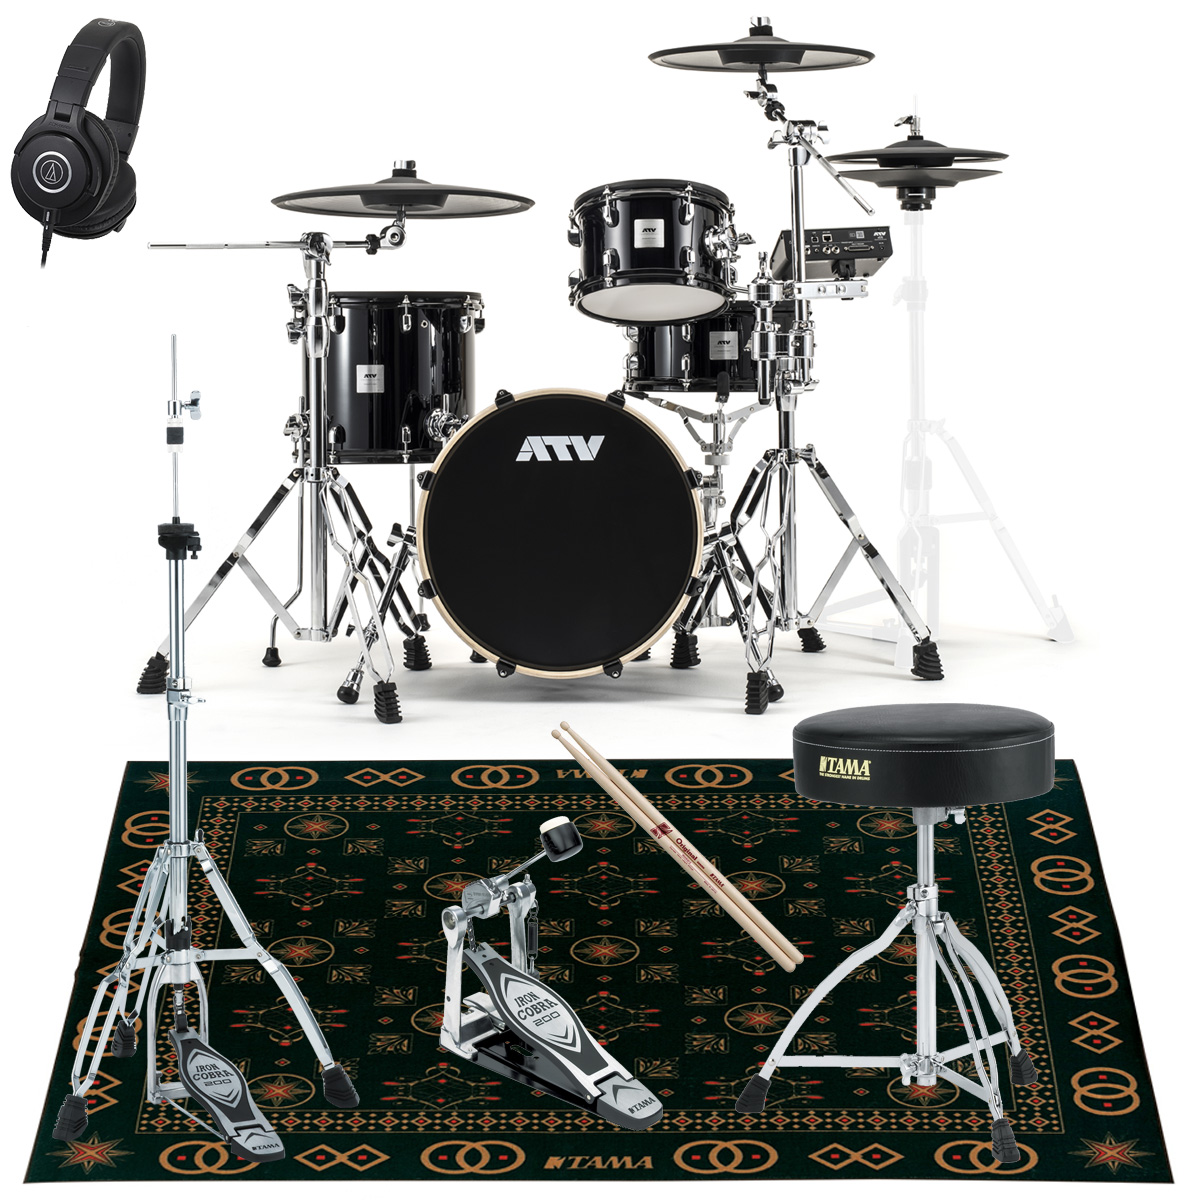 ATV / aDrums artist Standard Set ADA-STDSET オリジナルスターターパックT オリエント風マット付き《予約注文/納期12月上旬頃予定》